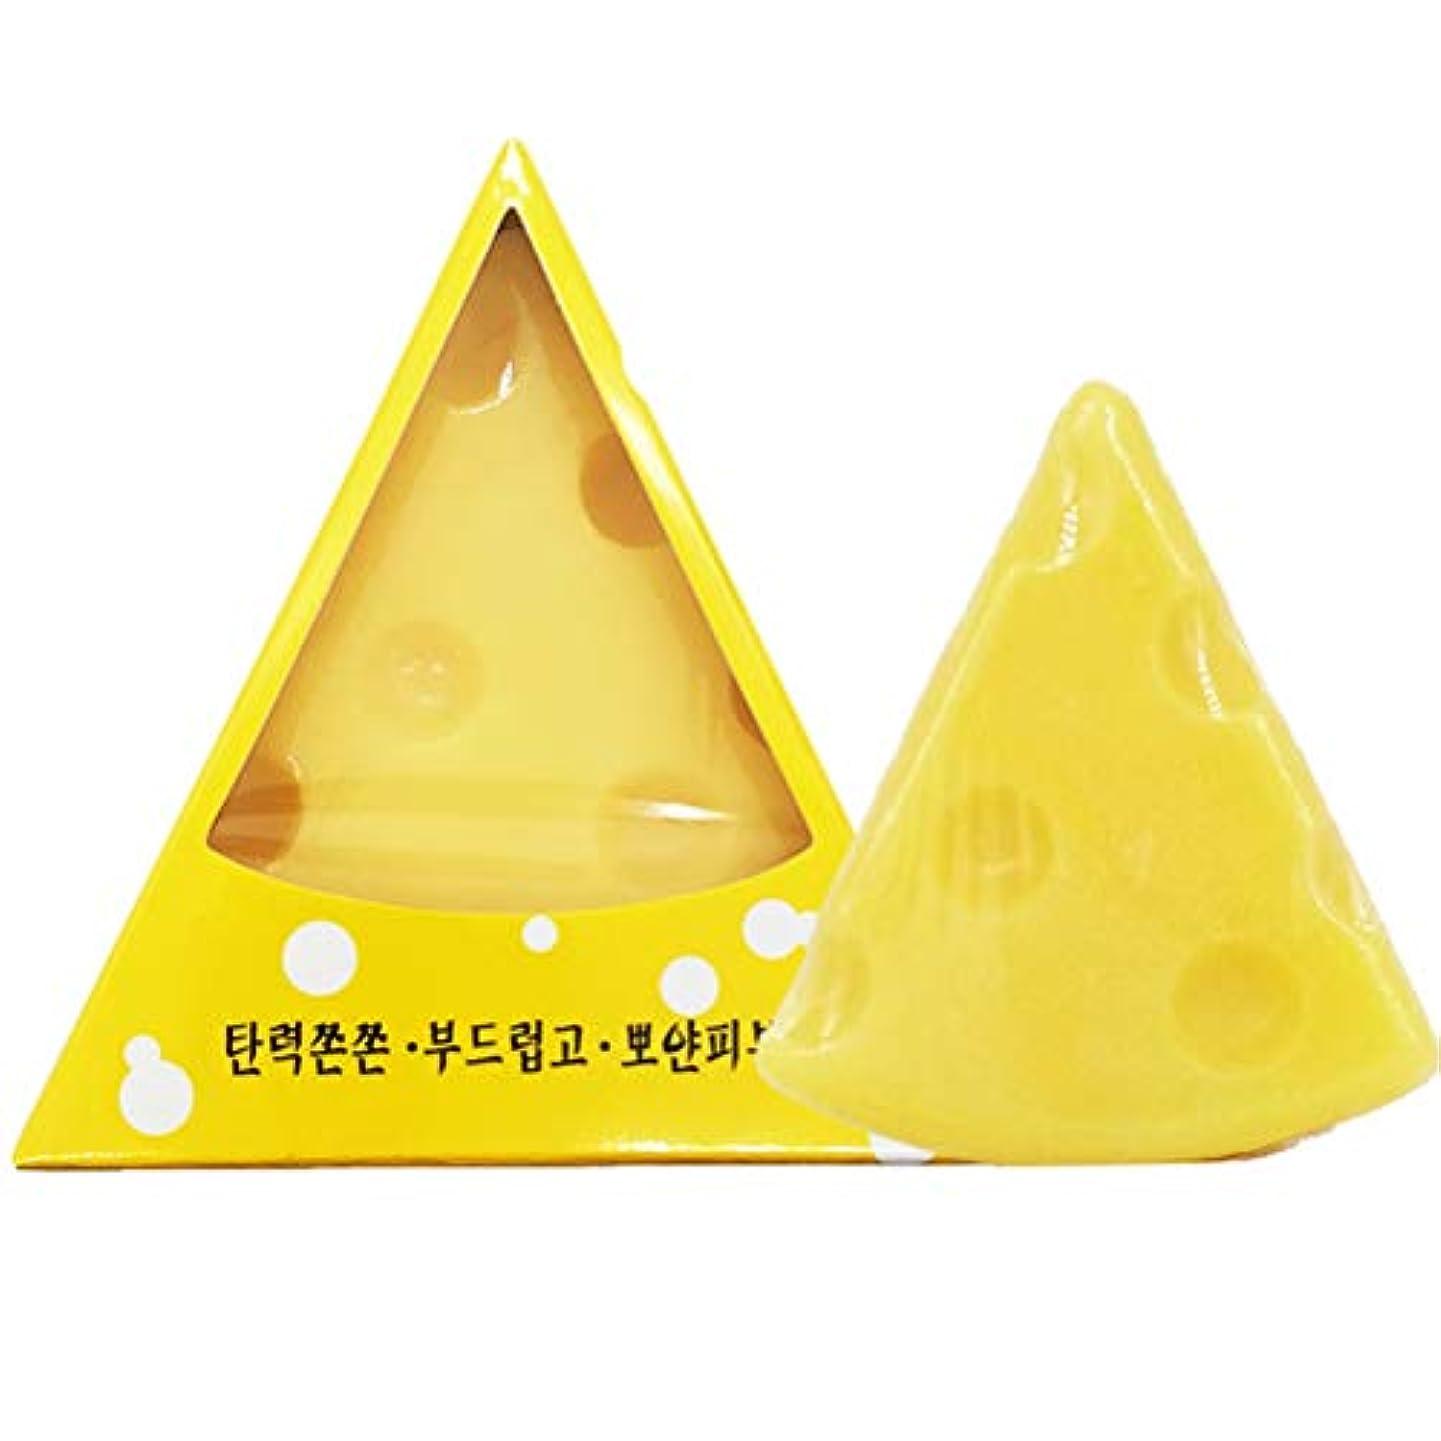 Ourine 石鹸 化粧石けん 浴用 全身 顔 チーズ デリケートゾーン 低刺激 保湿 アルコールフリー いい匂い